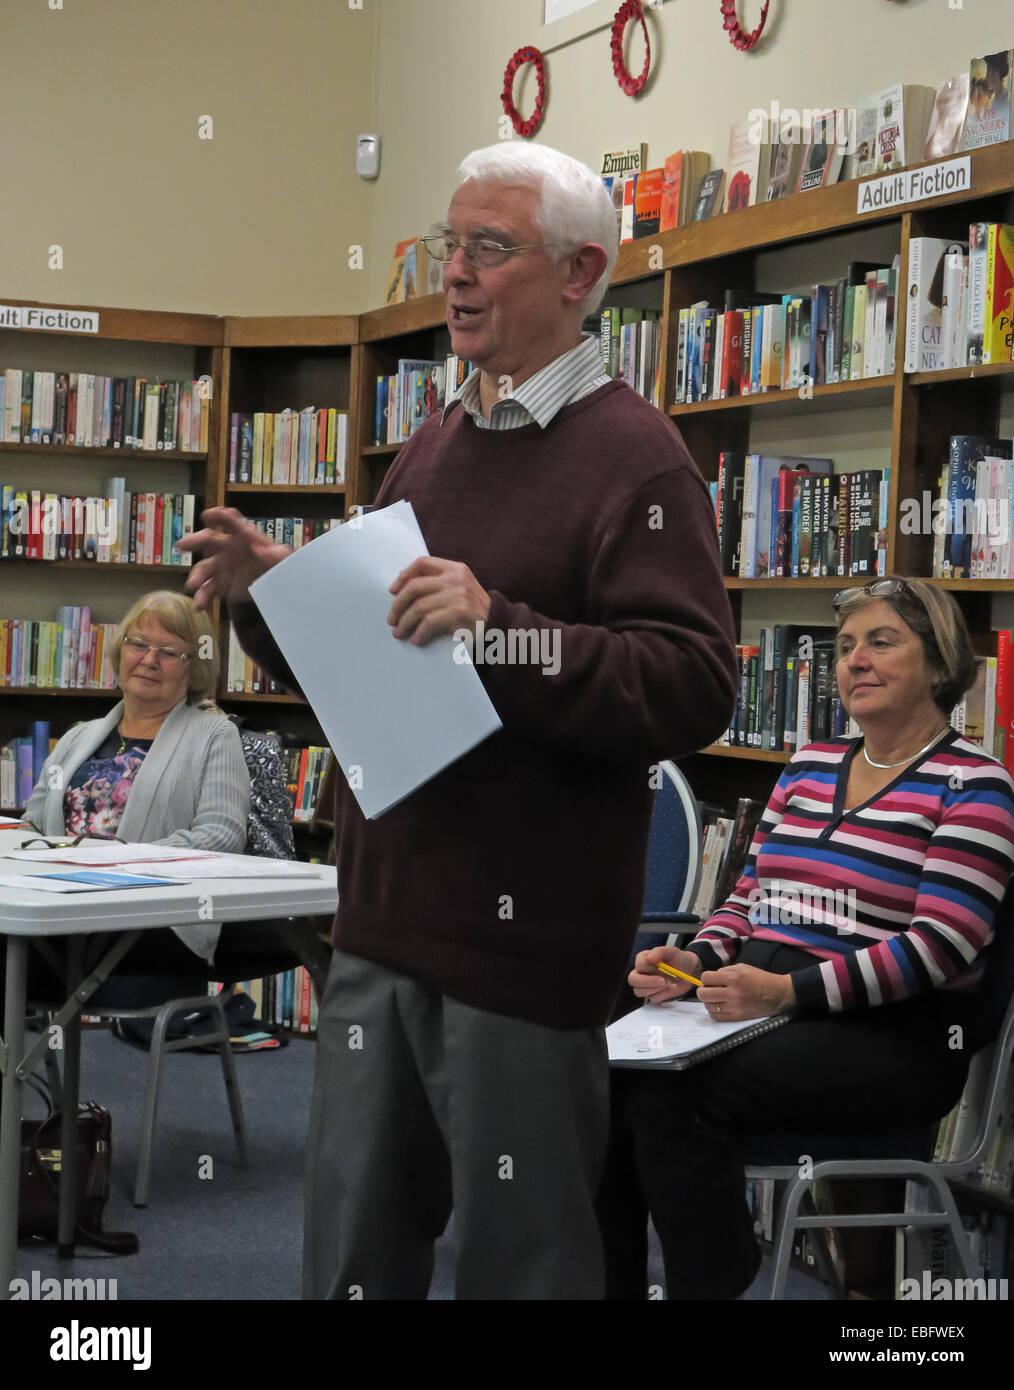 Laden Sie dieses Alamy Stockfoto Grappenhall Gemeindebibliothek GV 2014, John Ashby, Sheelagh Connolly, Sheila Wallace, Warrington, Cheshire WA4 2PE - EBFWEX